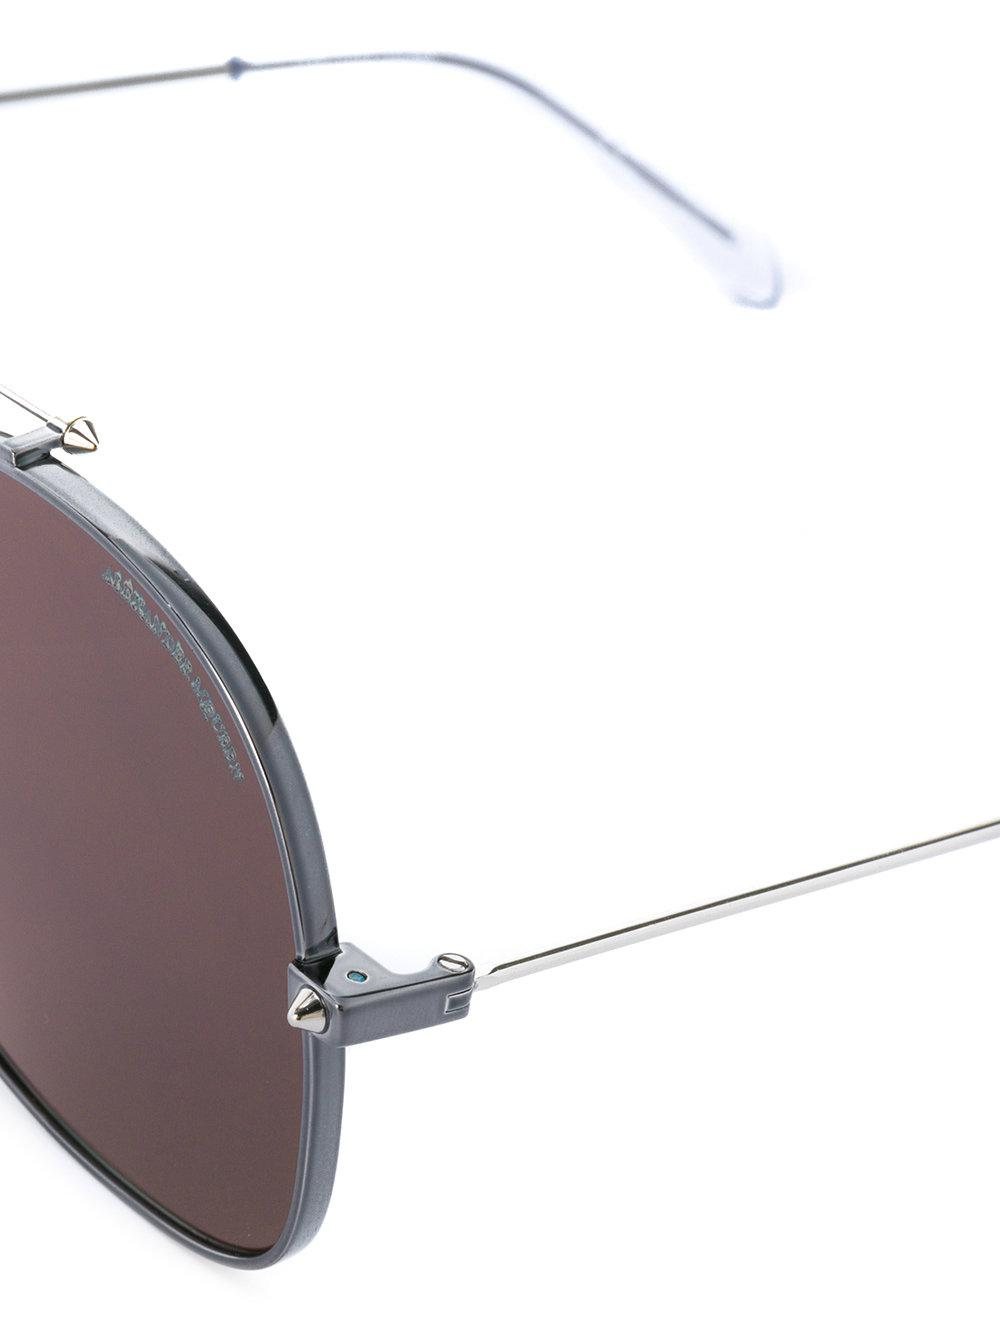 Alexander McQueen Oval Shaped Sunglasses in Black